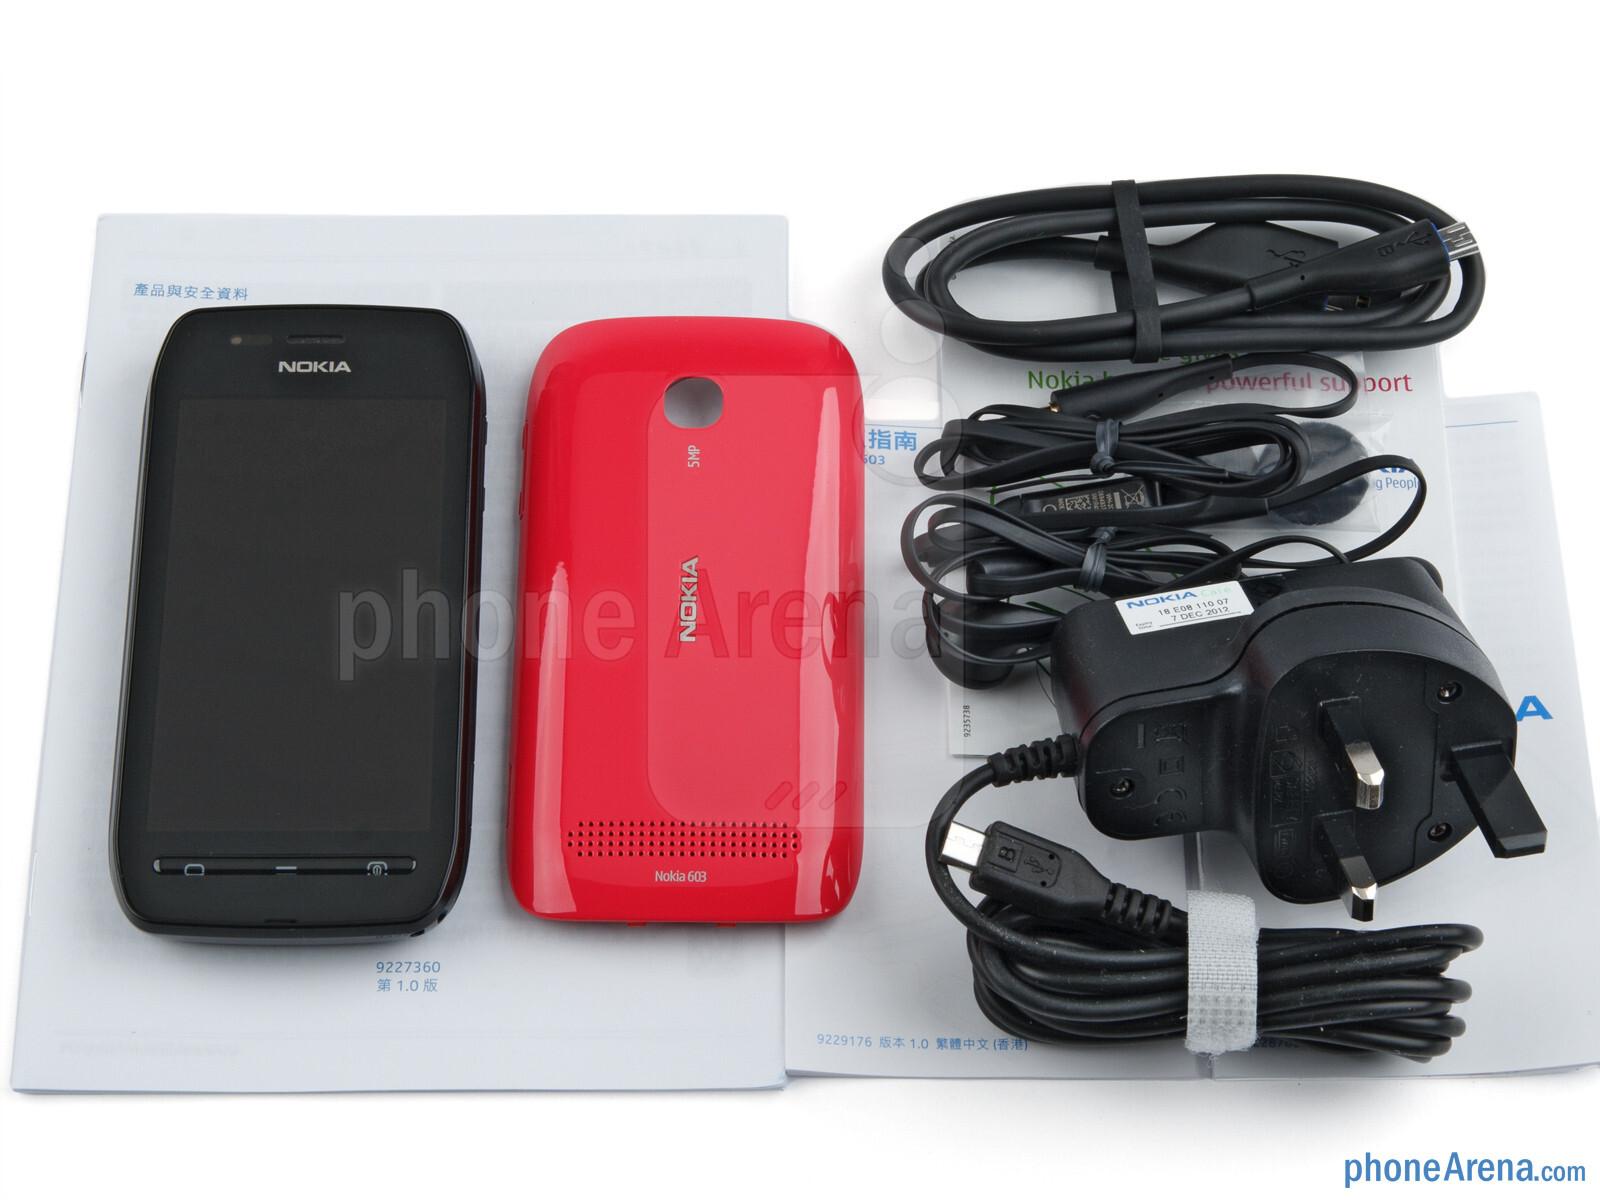 reputable site f8c8d c652b Nokia 603 Review - PhoneArena